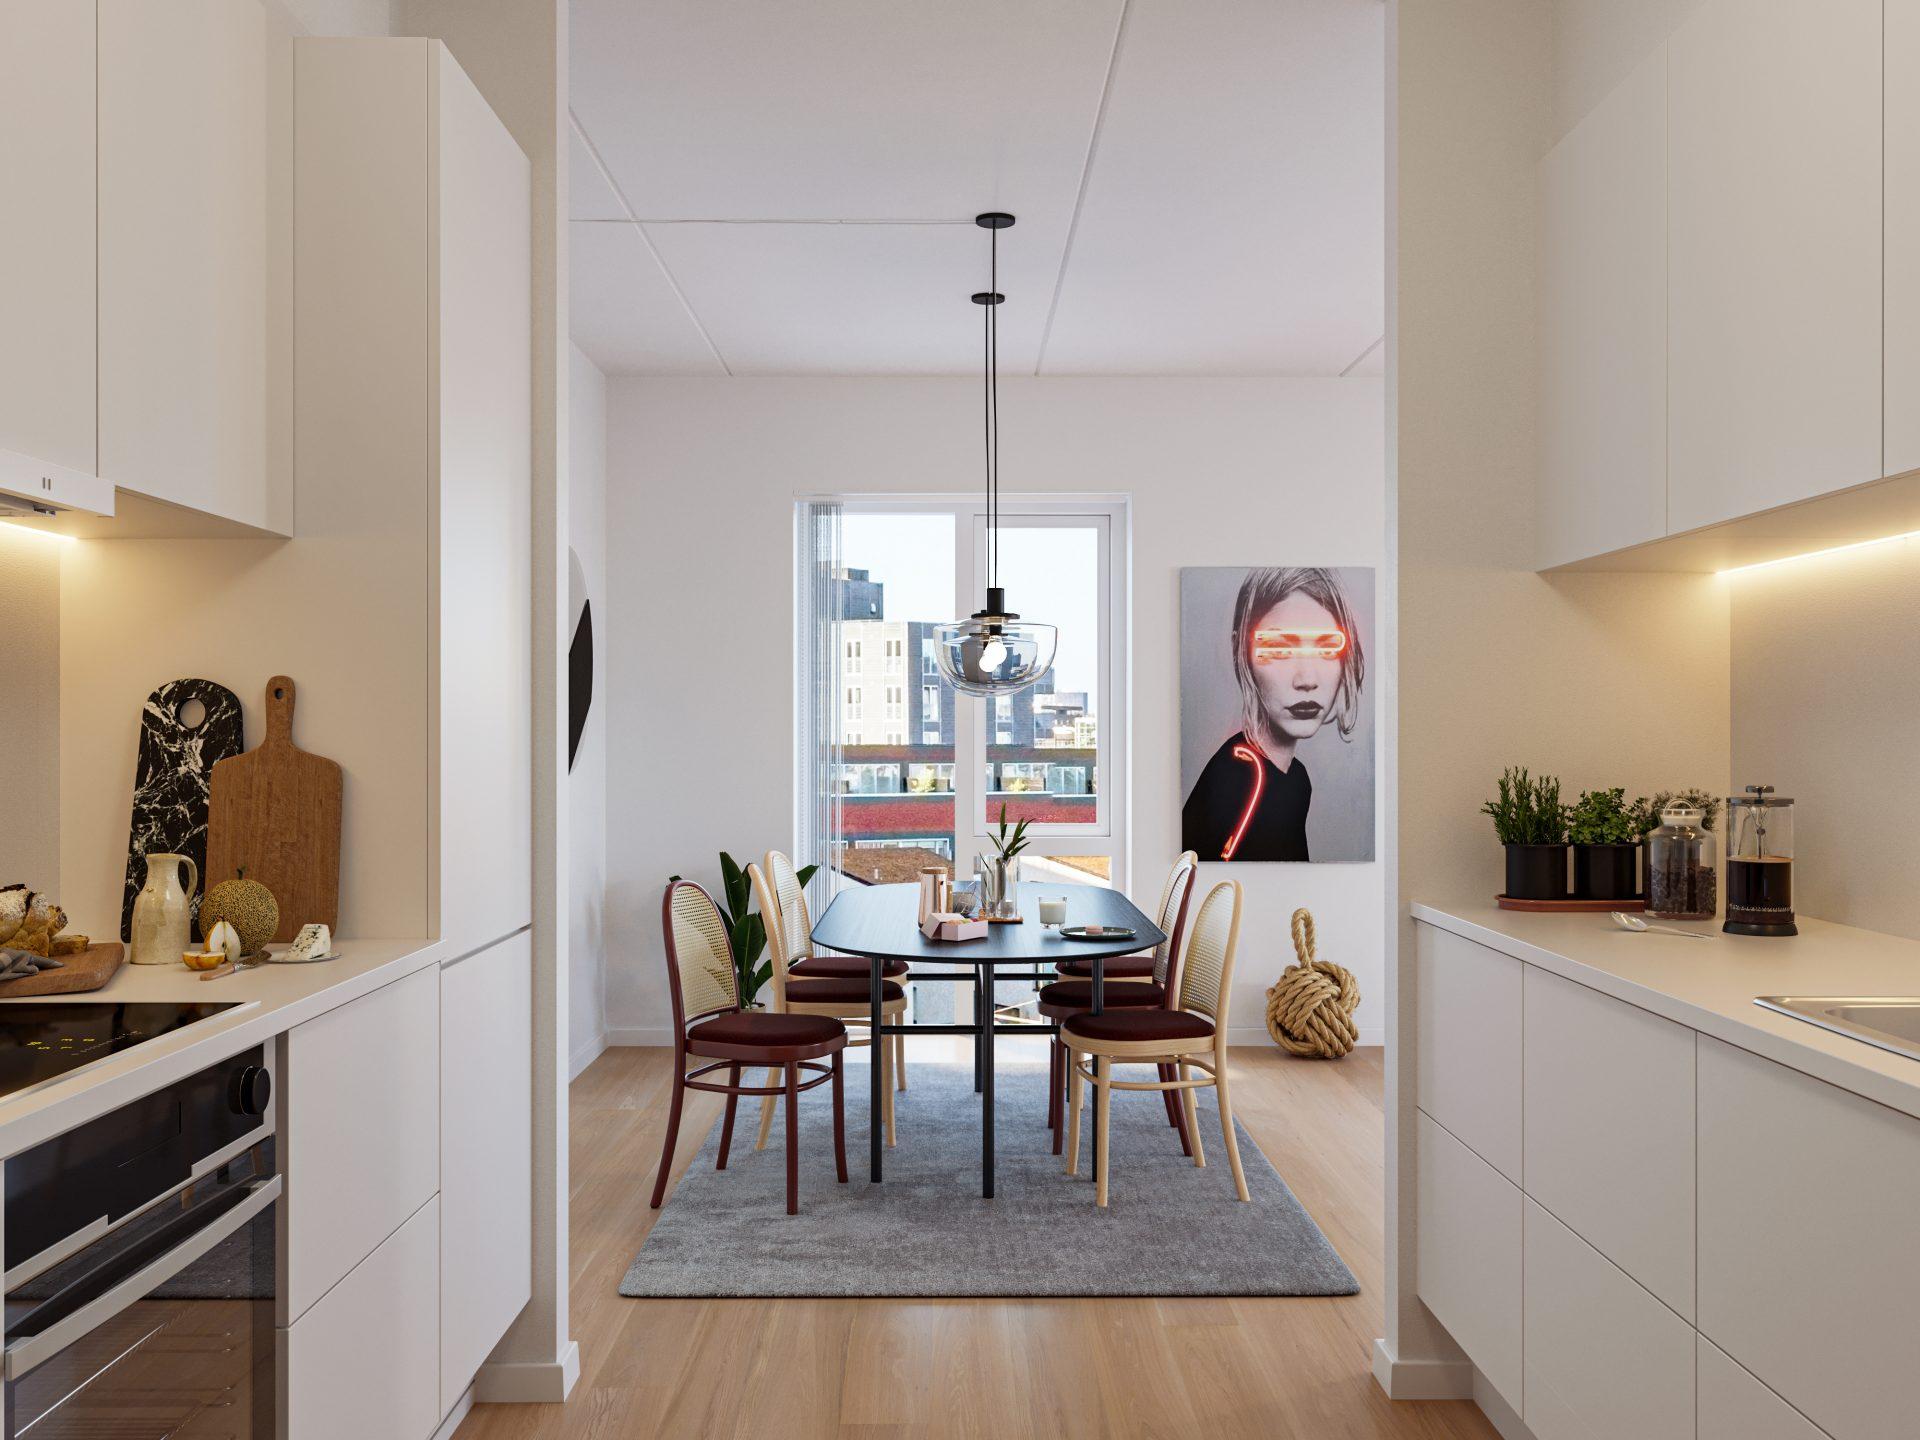 1686_Nordkranen_Fortkaj--DK_INT_TypeC_kitchen